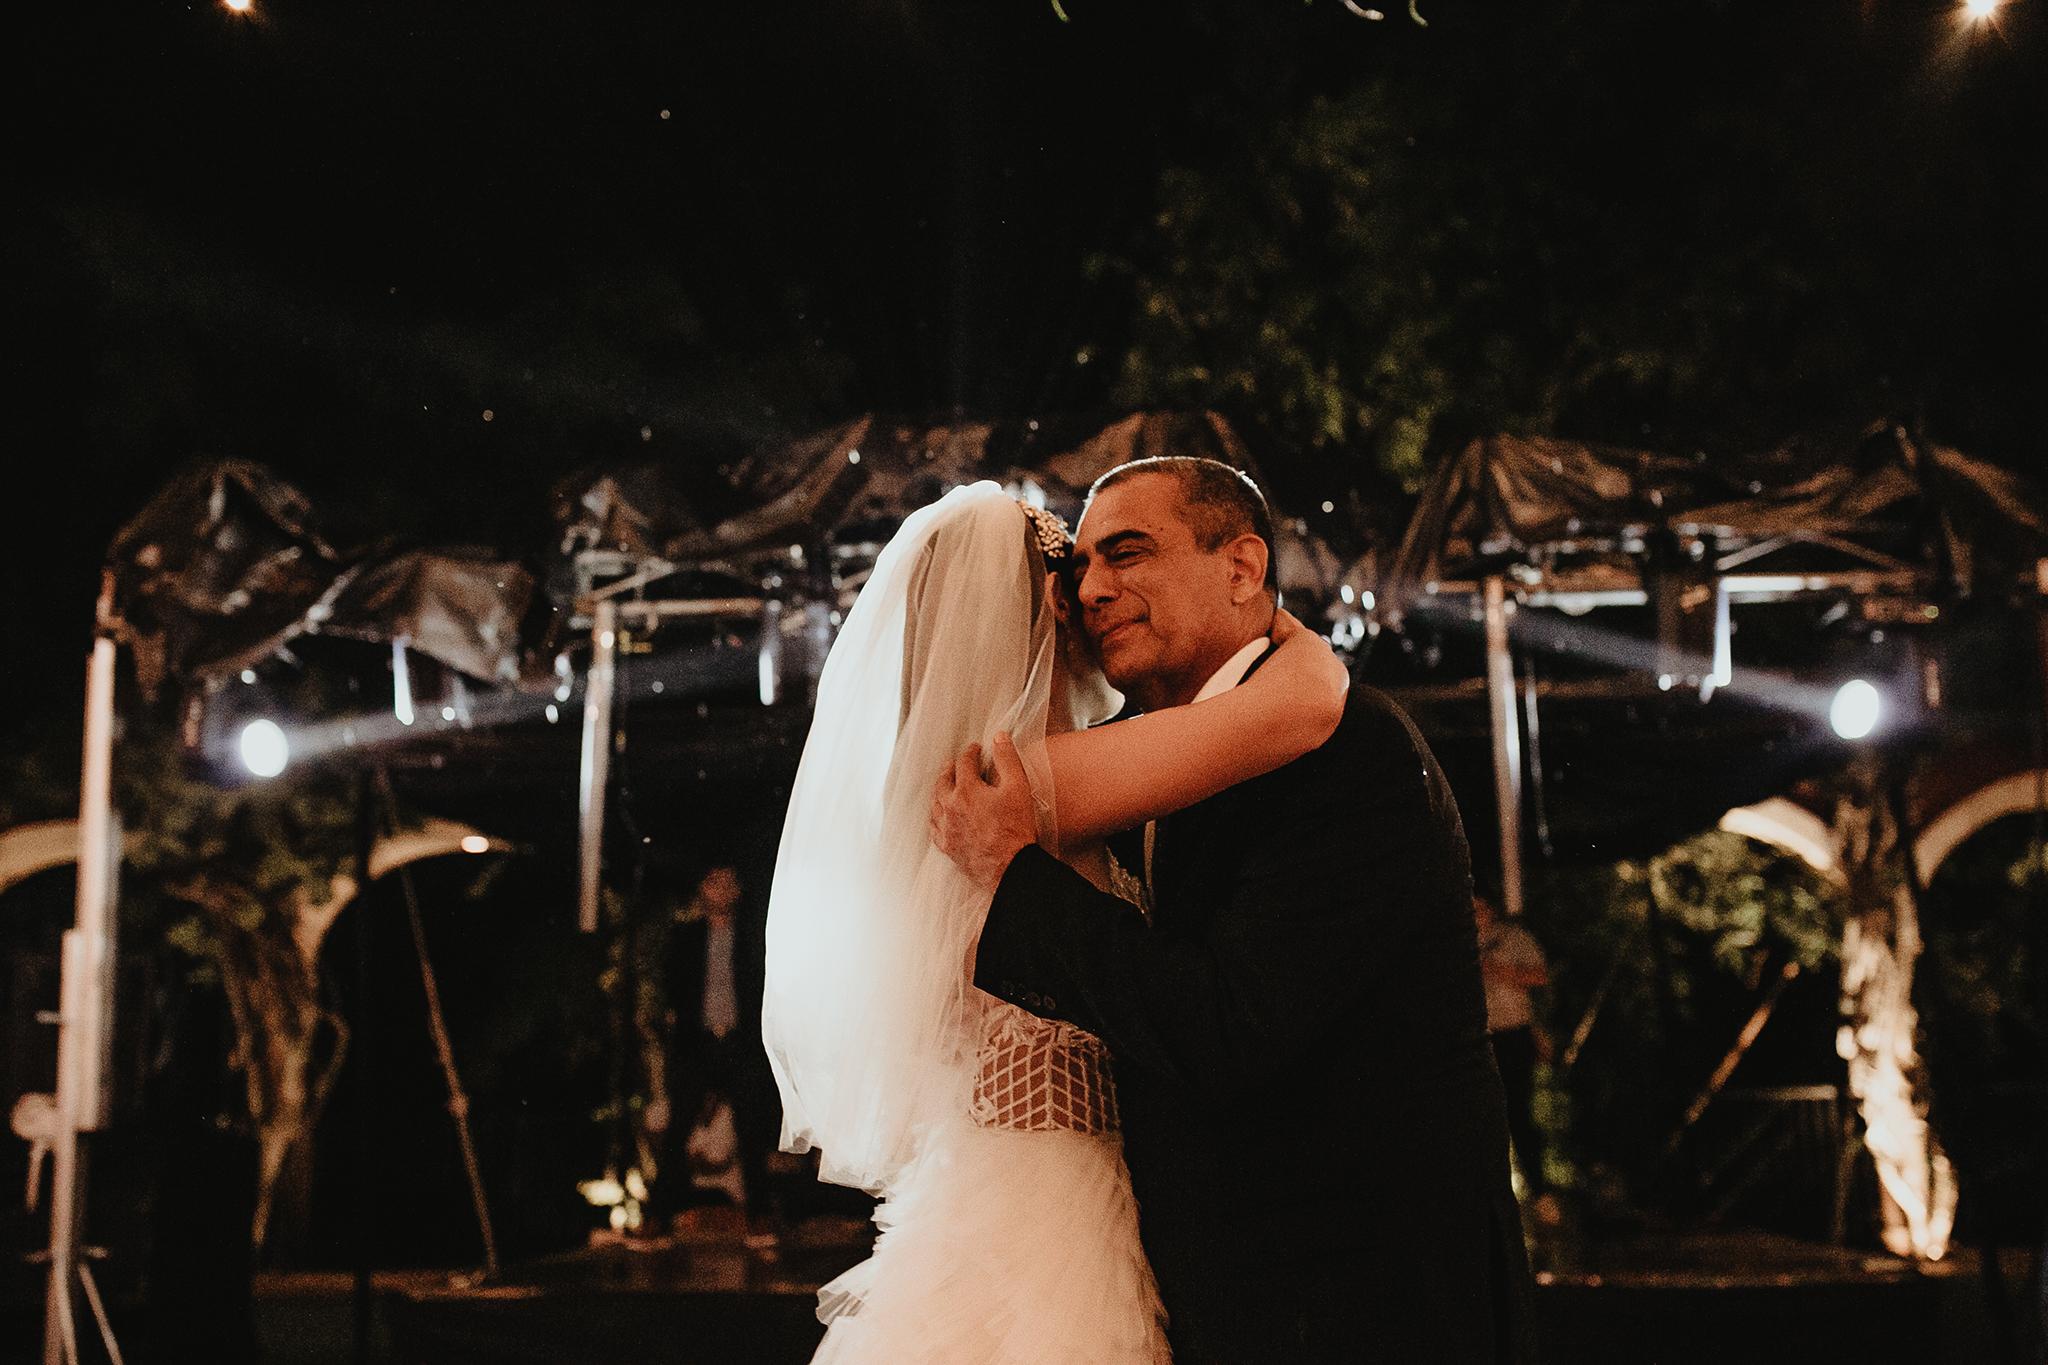 1046R&F__WeddingDestination_Weddingmerida_BodaMexico_FotografoDeBodas_FabrizioSimoneenFotografo.jpg